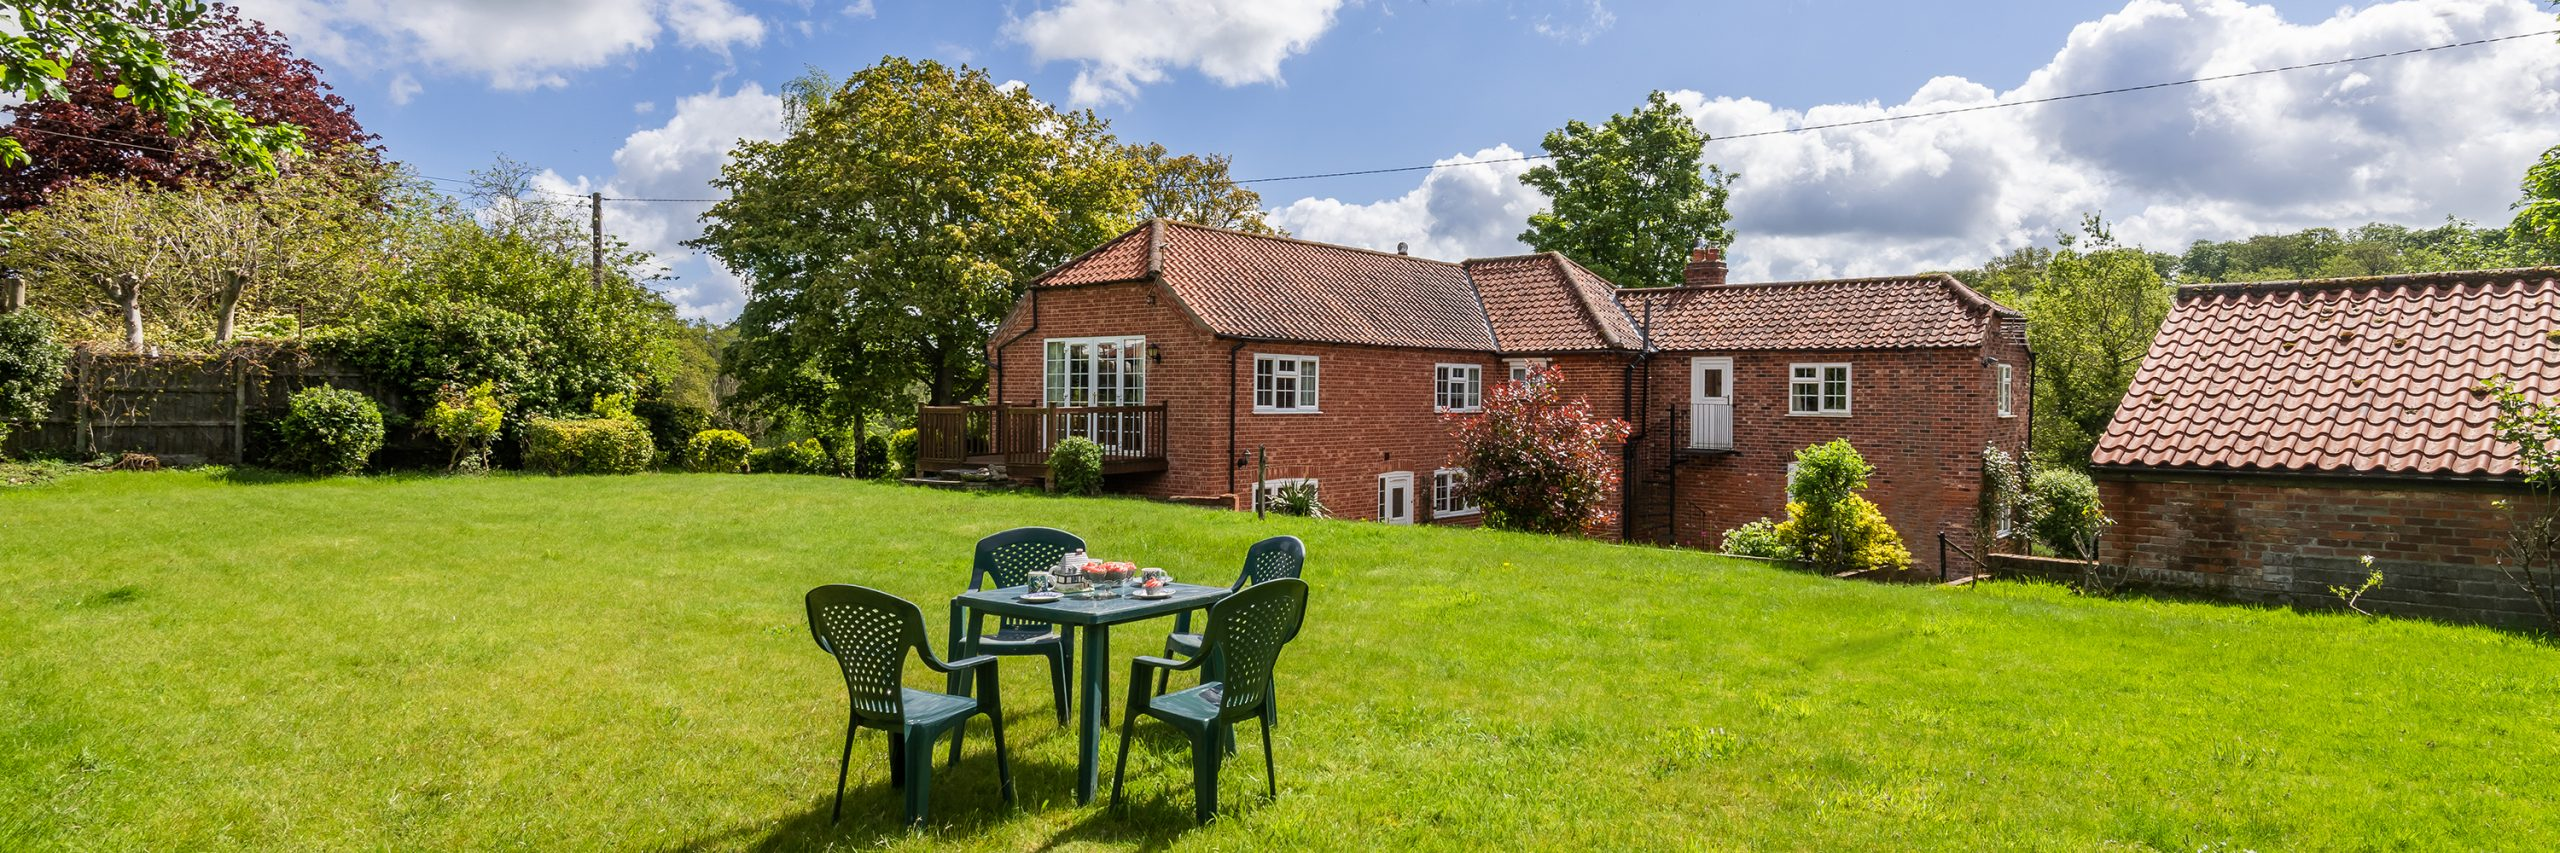 School Cottage, Ranworth